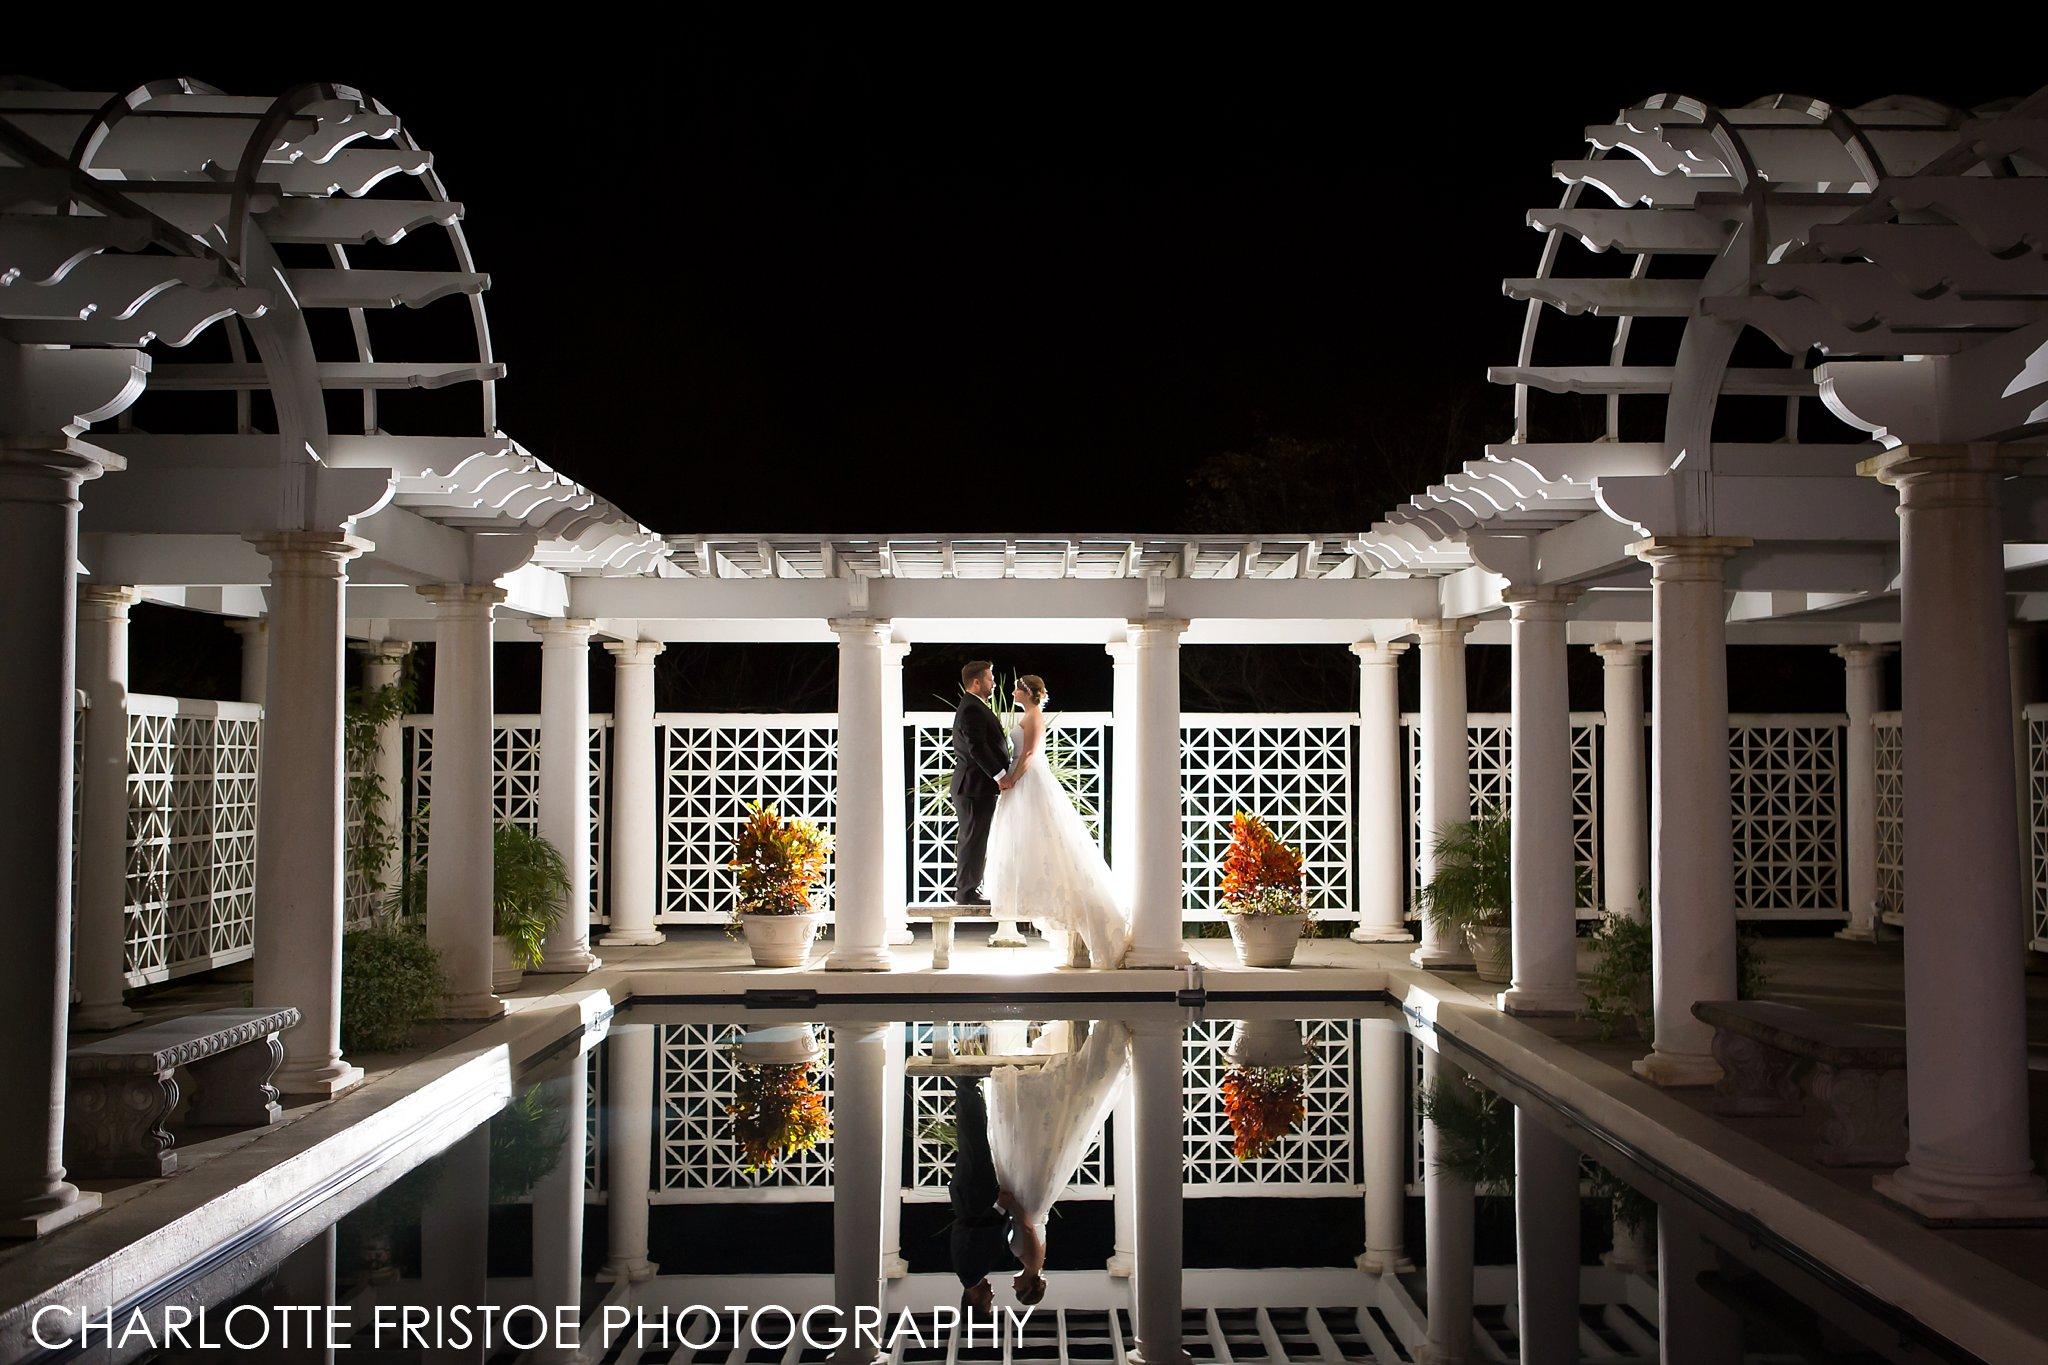 Charlotte Fristoe Photography Blog-79.jpg